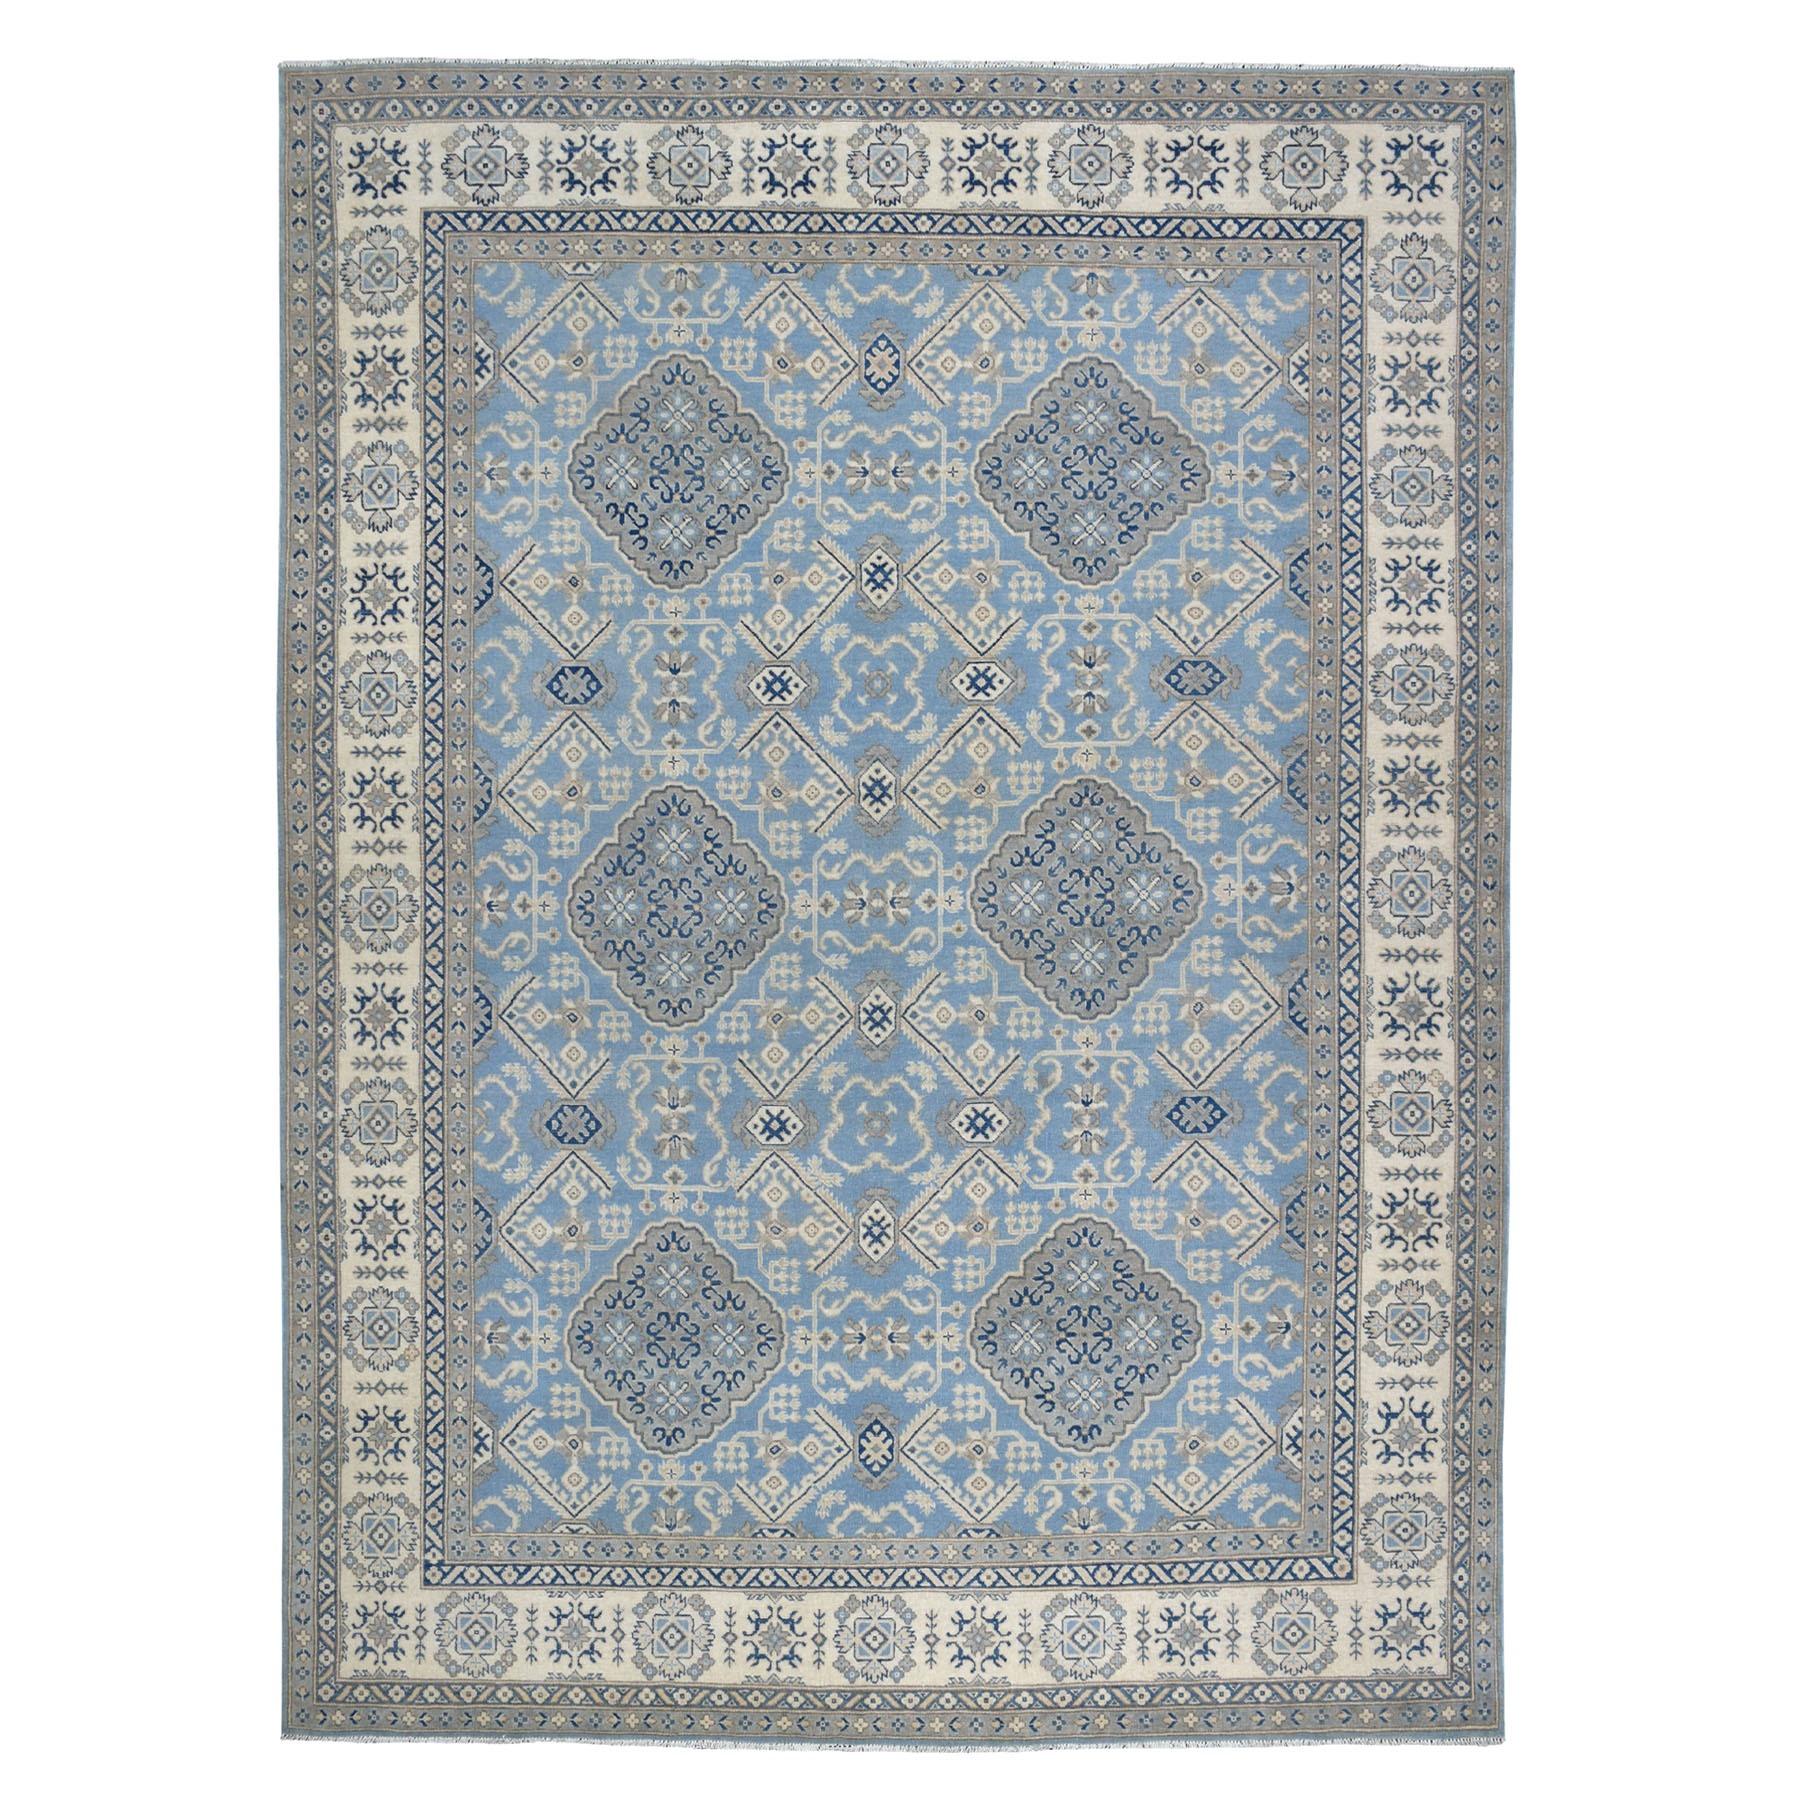 "9'X11'9"" Blue Vintage Look Kazak Geometric Design Pure Wool Hand Knotted Oriental Rug moaebaee"